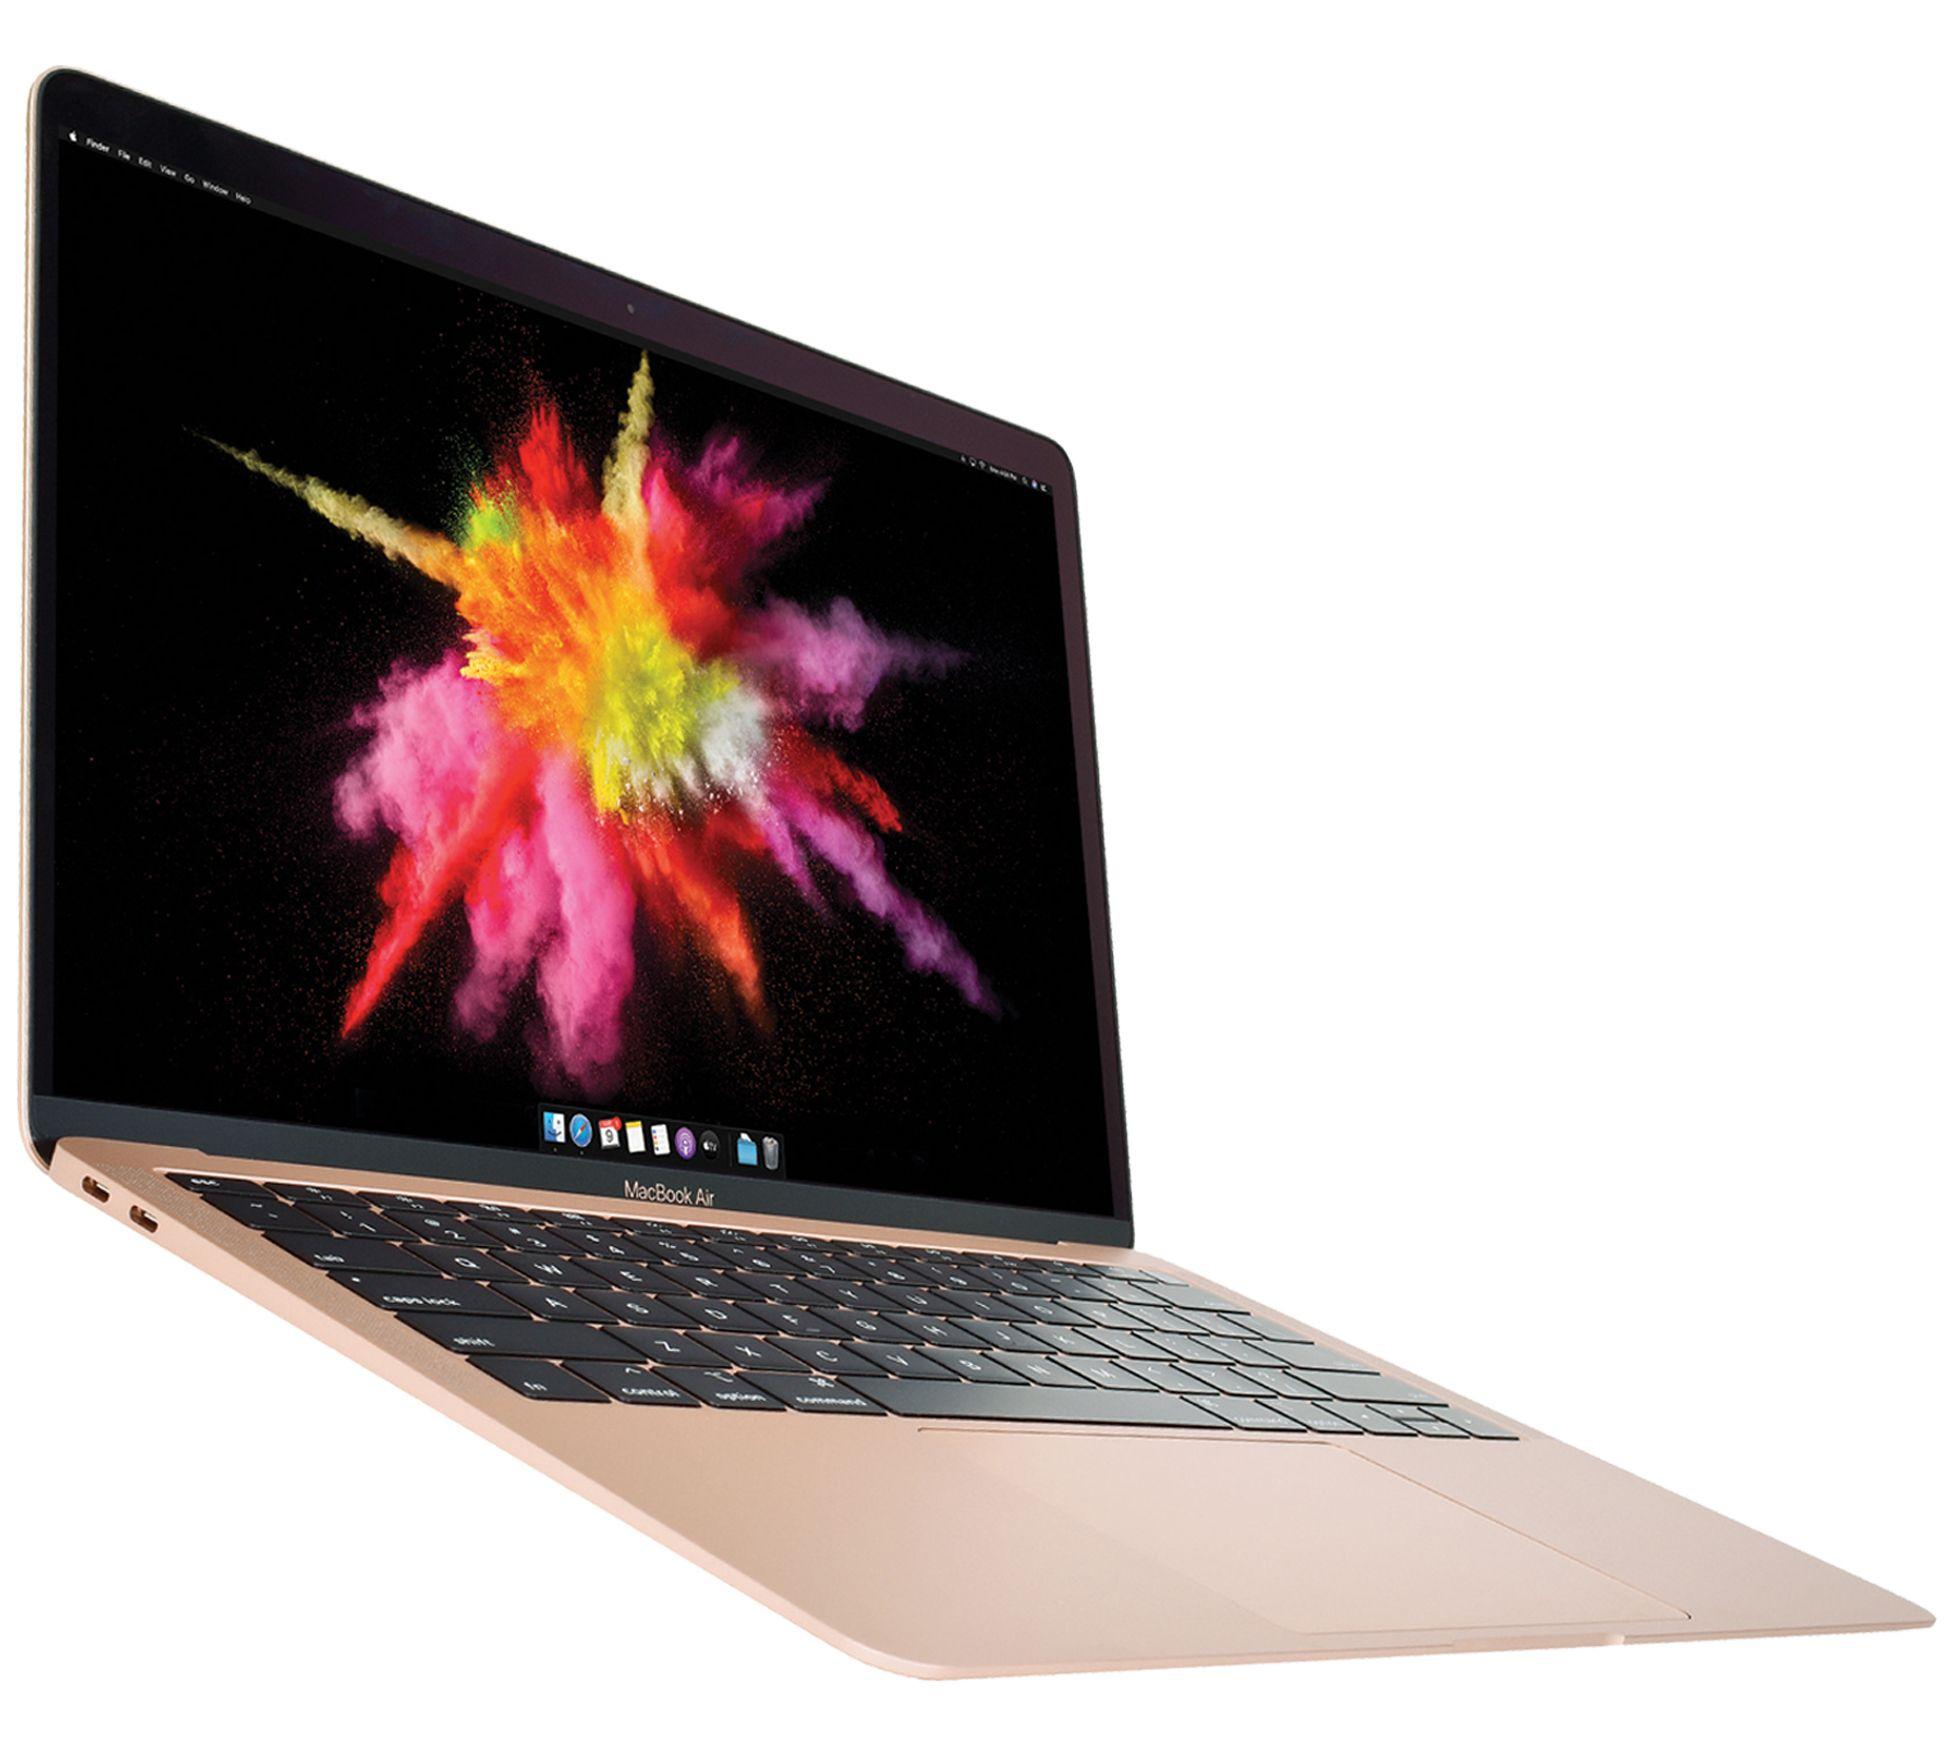 "2020 Apple MacBook Air 13"" Retina Core i3 256GB SSD with Accessories - QVC.com"